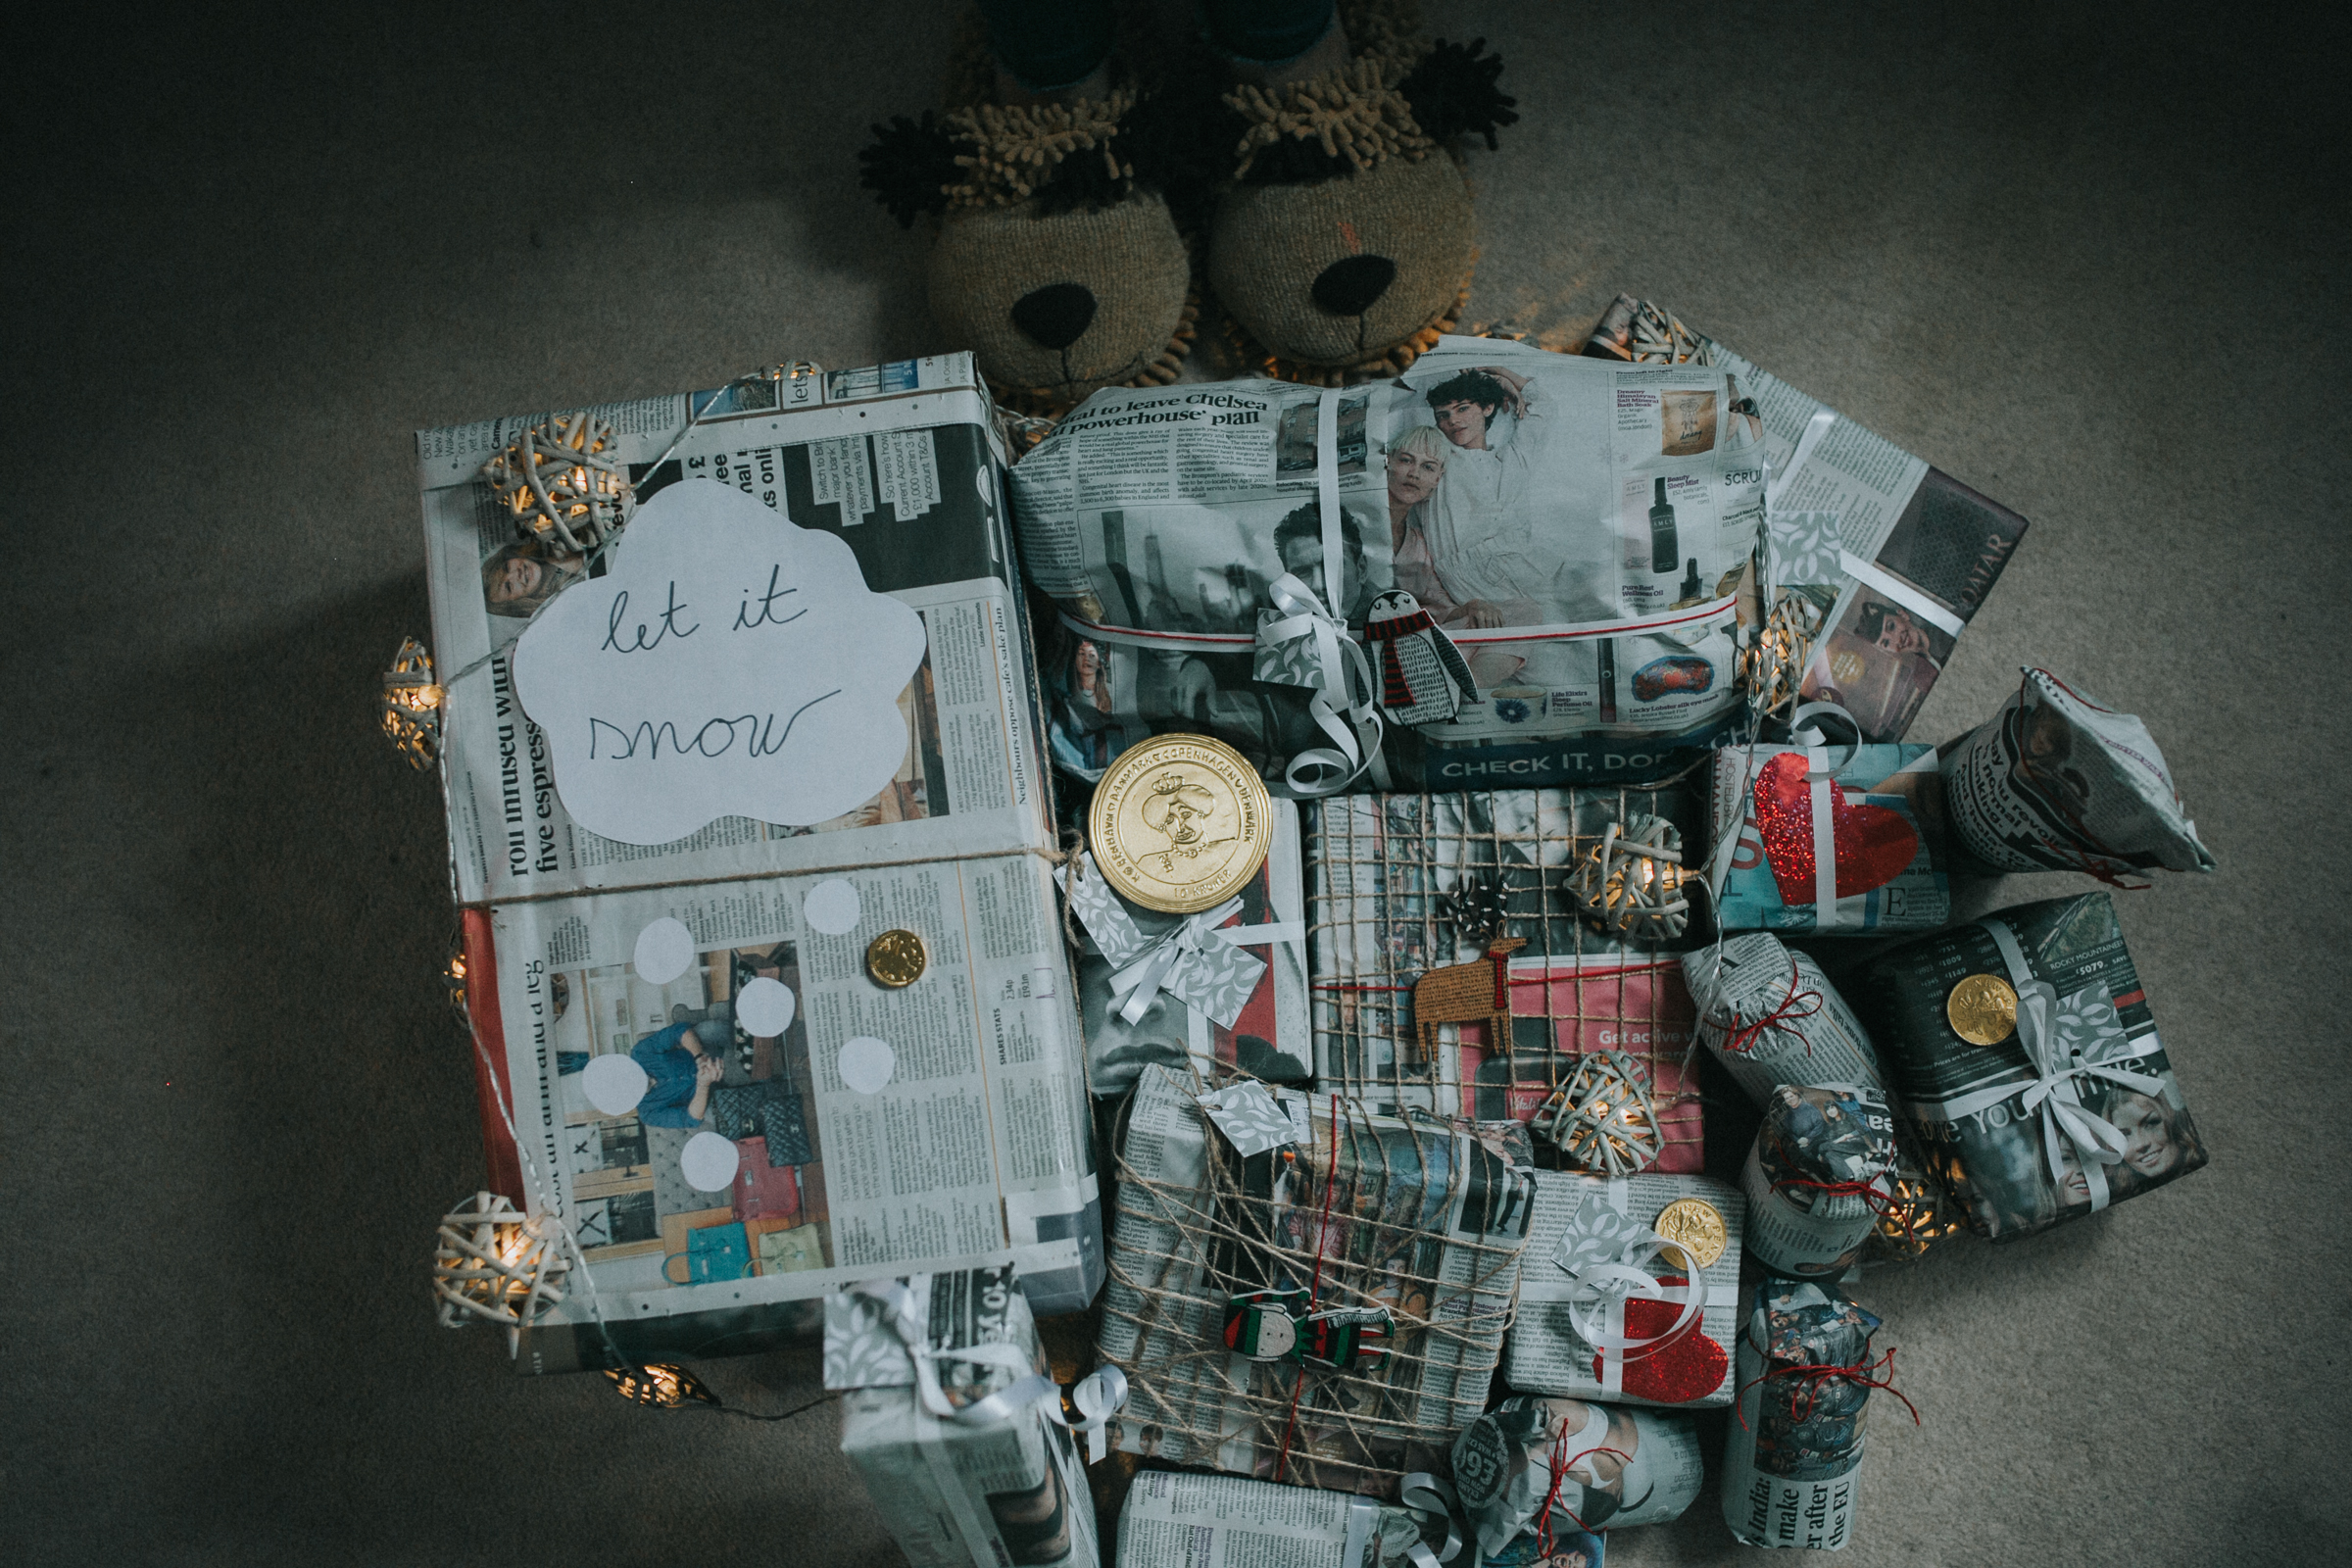 Christmas-gift-wrapping-ideas-minas-planet-minasplanet-how-to-wrap-christmas-presents-diy9.jpg